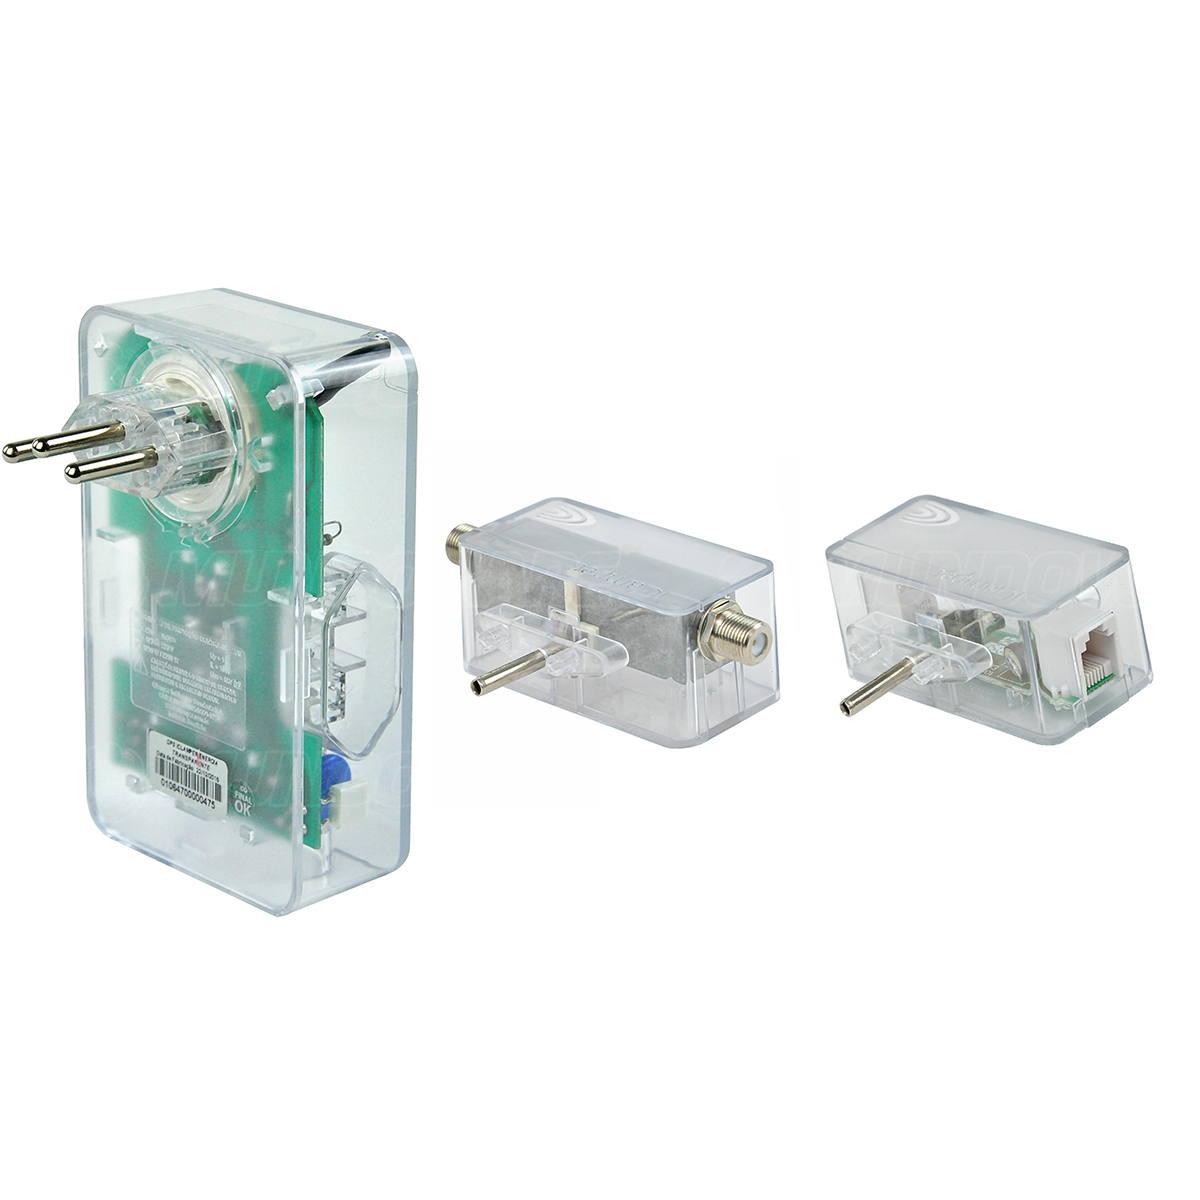 Combo 3 em 1 DPS Clamper 3 Tomadas Energia 3 + iClamper Tel para RJ11 + iClamper Cabo para Coaxial p/ Proteção Completa